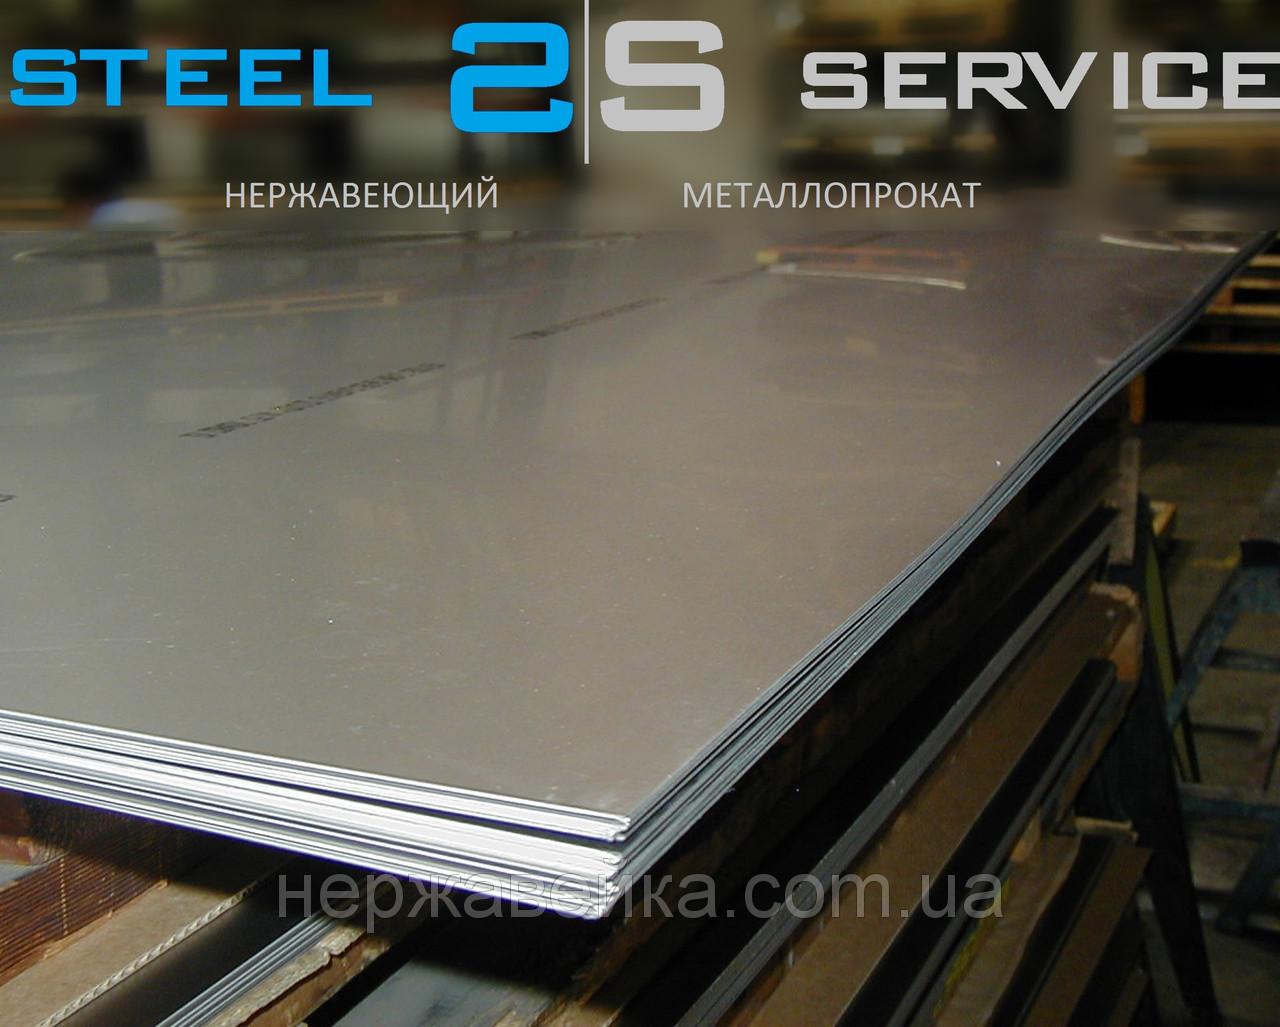 Нержавейка лист 8х1000х2000мм  AISI 316L(03Х17Н14М3) F1 - горячекатанный,  кислотостойкий